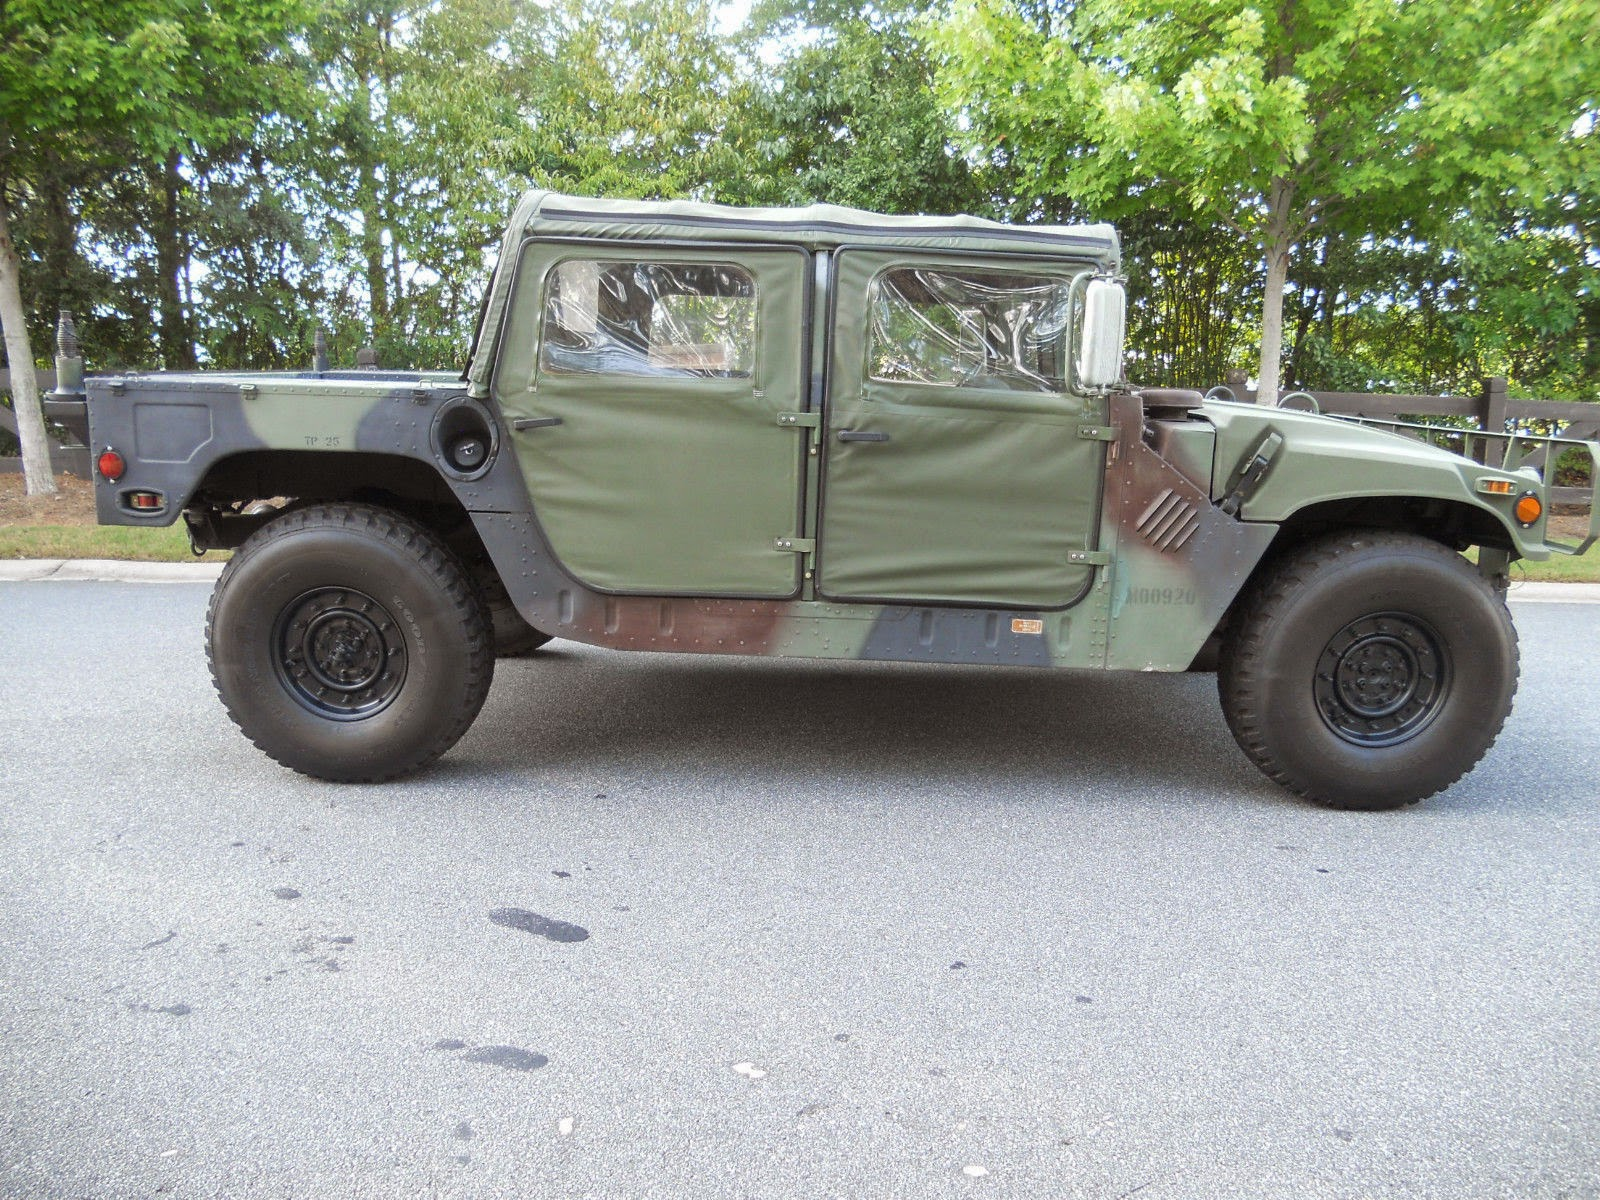 Military Humvee For Sale on Custom Jeep Kaiser M715